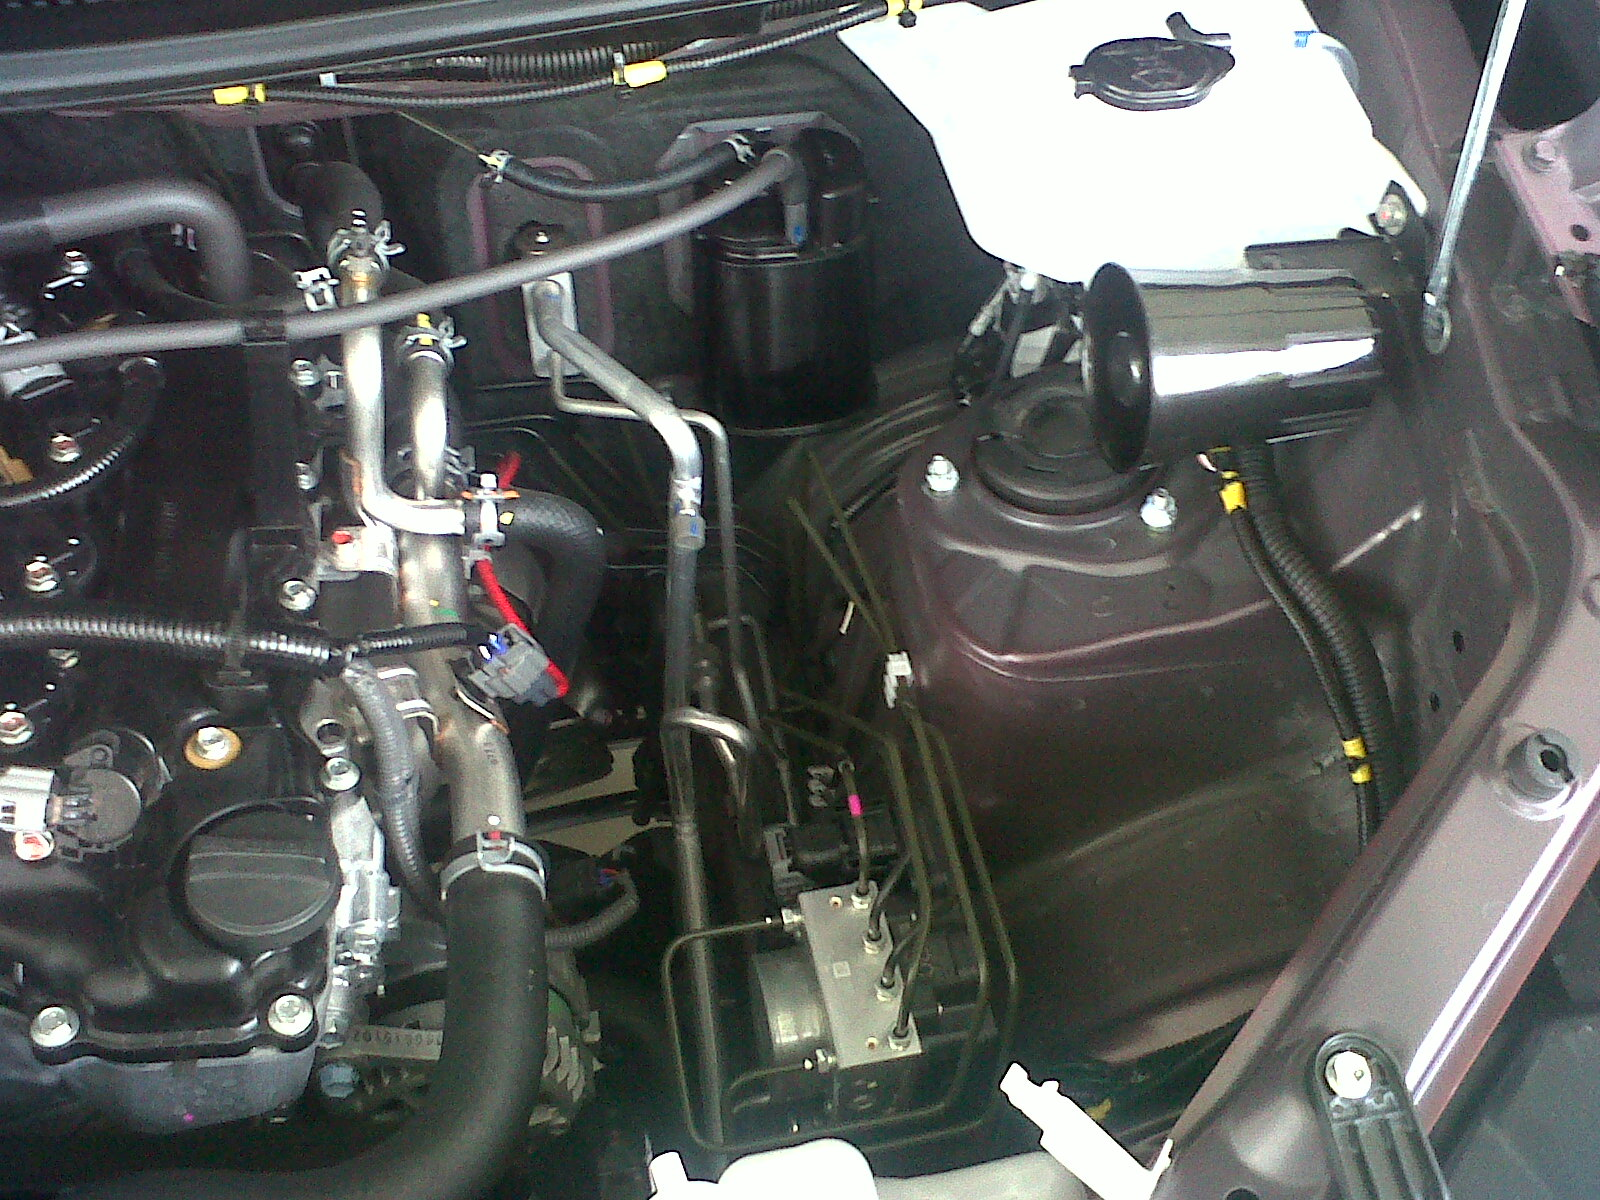 Grand New Avanza Tipe E Abs Head Unit Veloz 1.5 Toyota Cash Credit Or Trade In Type 1 3 G 5 Dan Kecuali Sudah Dilengkapi Sistem Pengereman Anti Lock Braking Proteksi